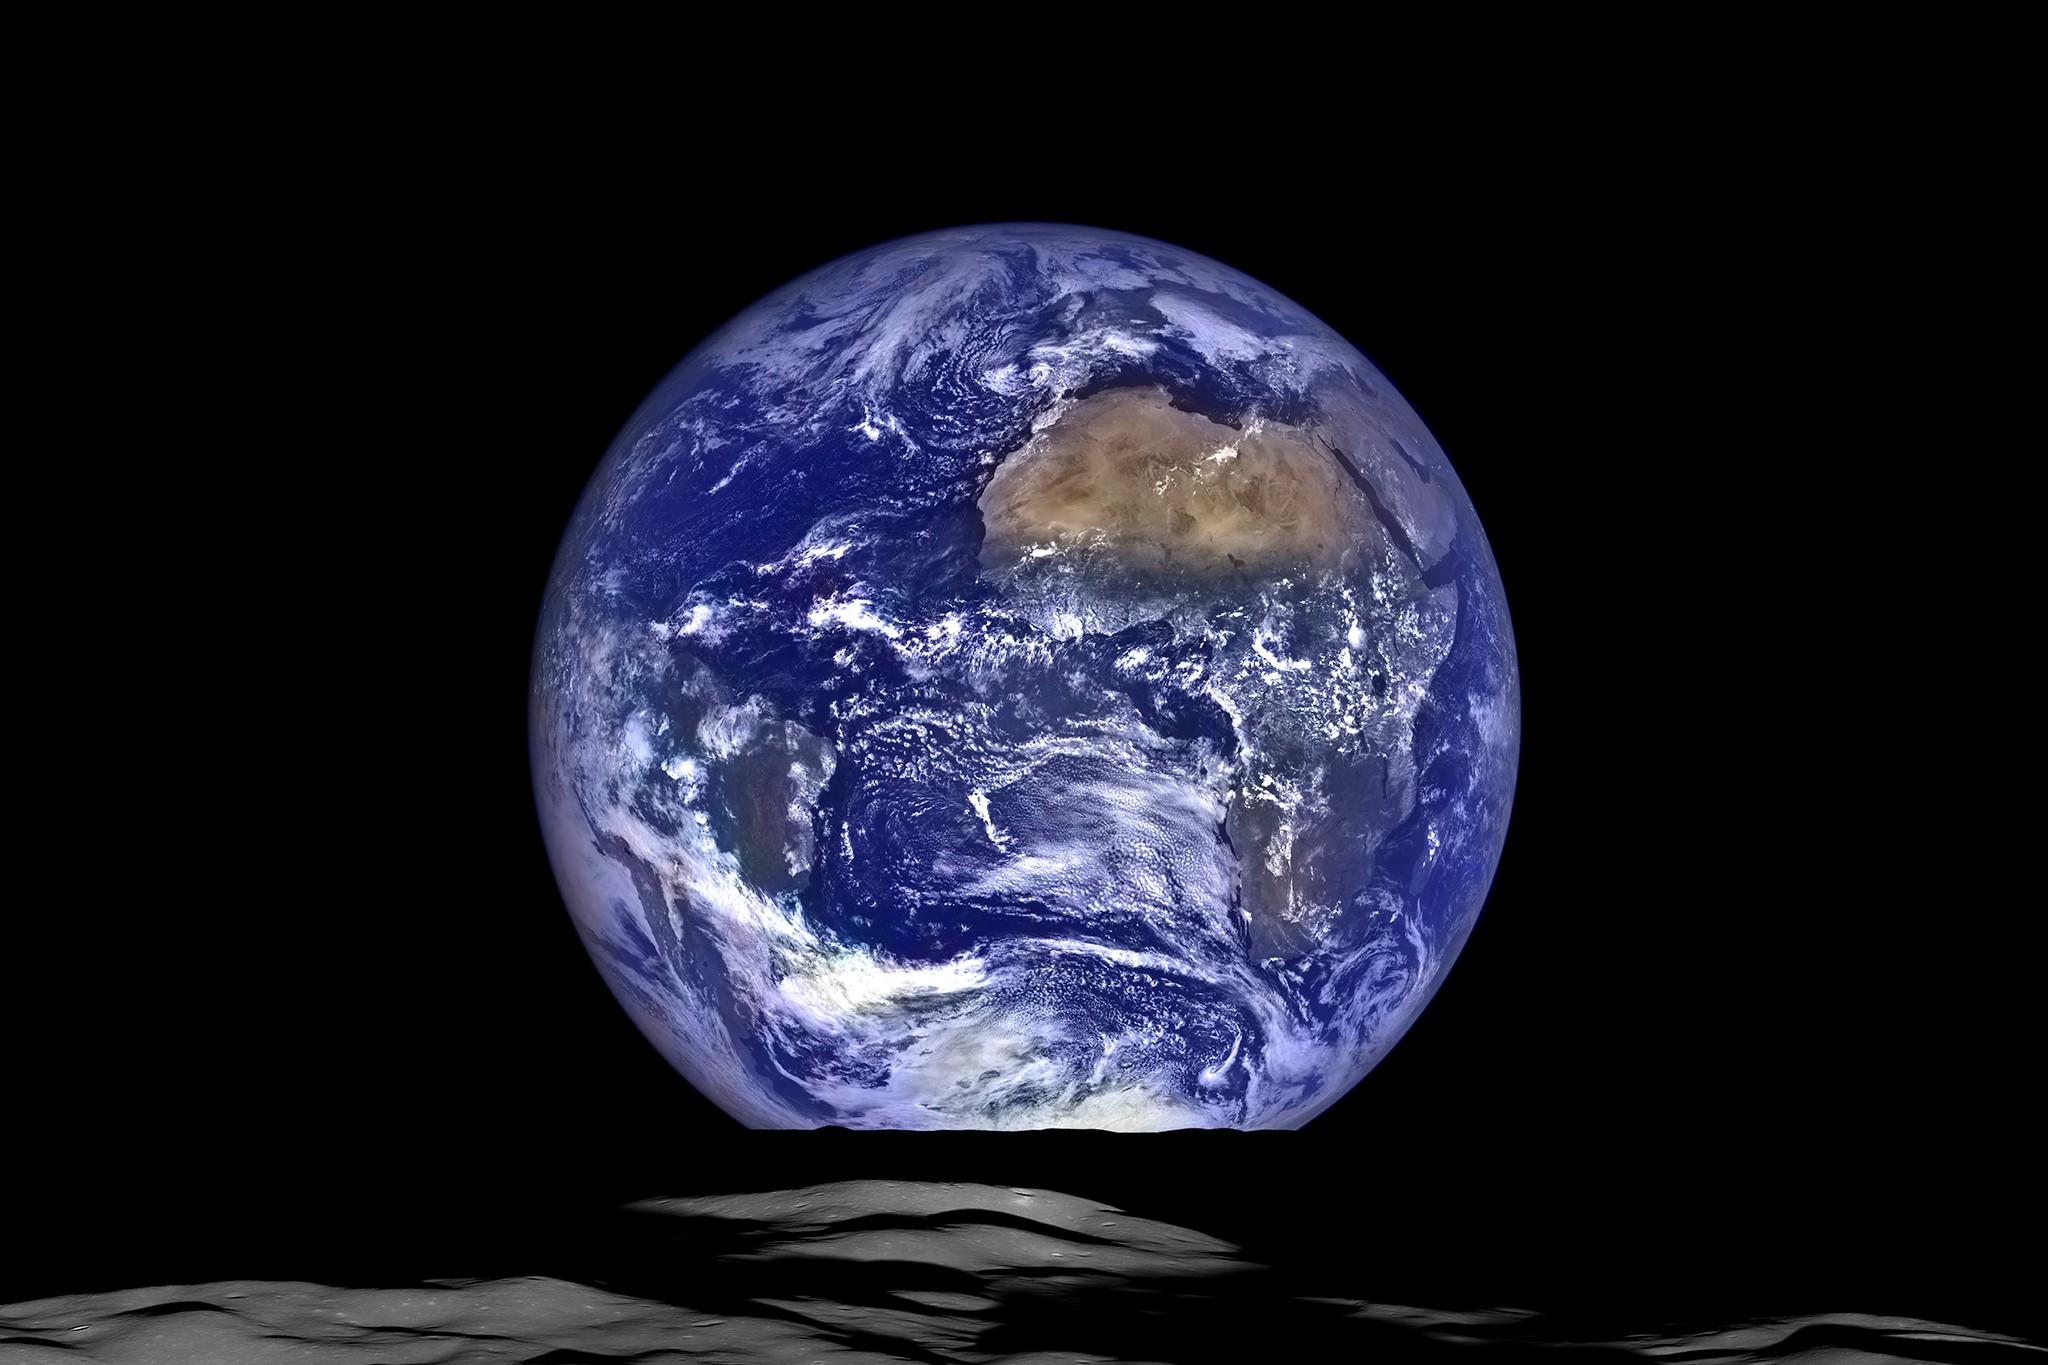 https://kolorline.hu/Ma van a Föld napja